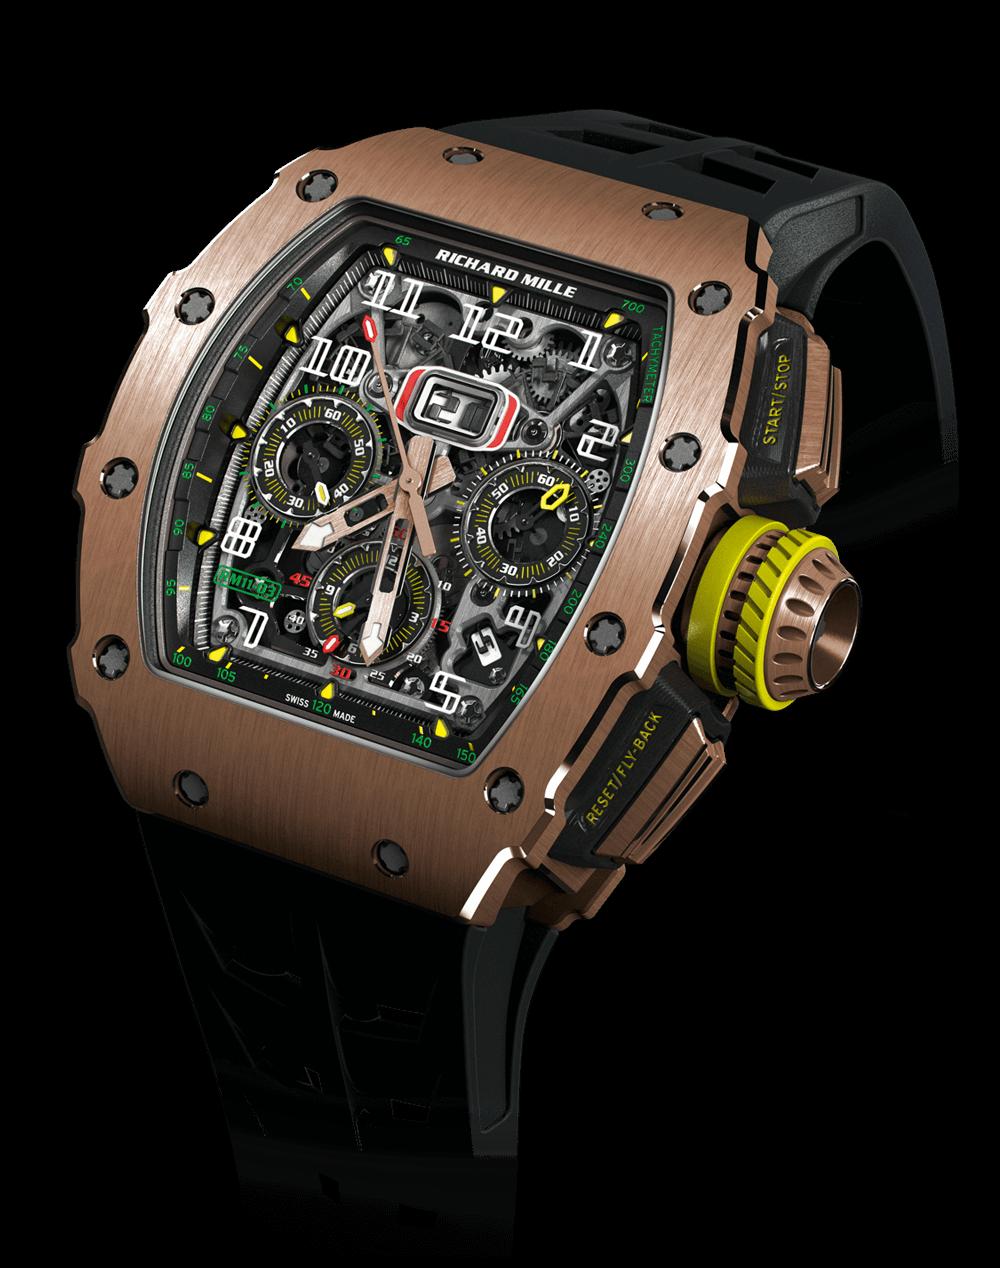 Richard Mille RM 11-03 Jean Todt 50th Anniversary Watch